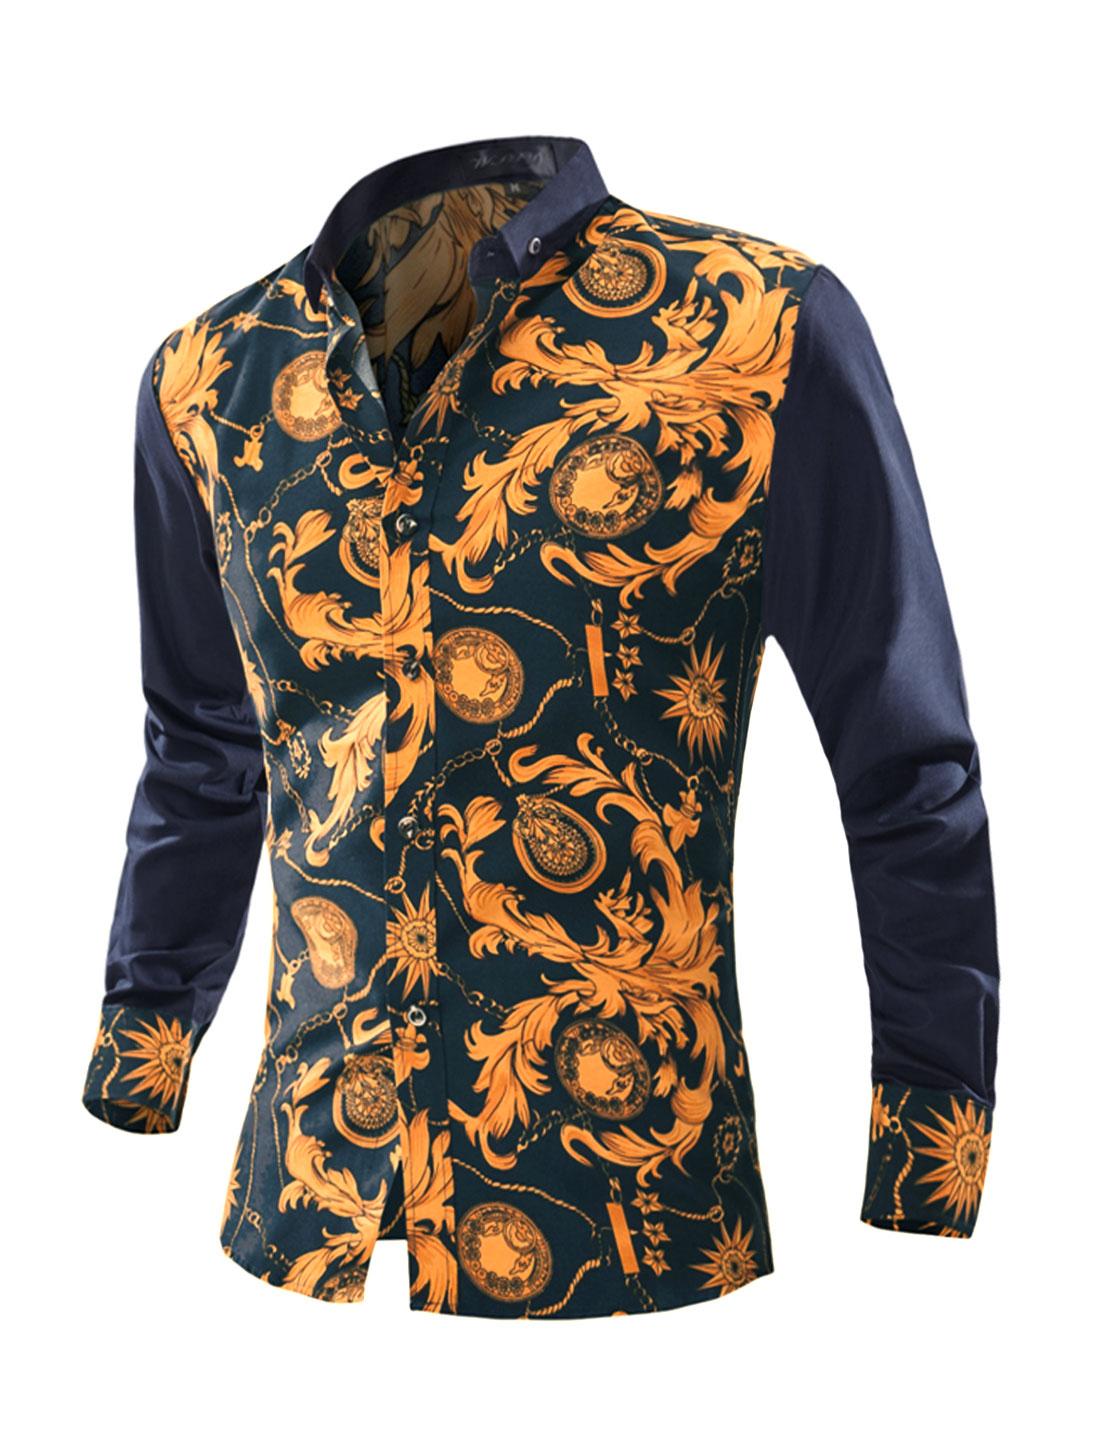 Men Long Sleeves Buttoned Slim Fit Novelty Shirt Blue M